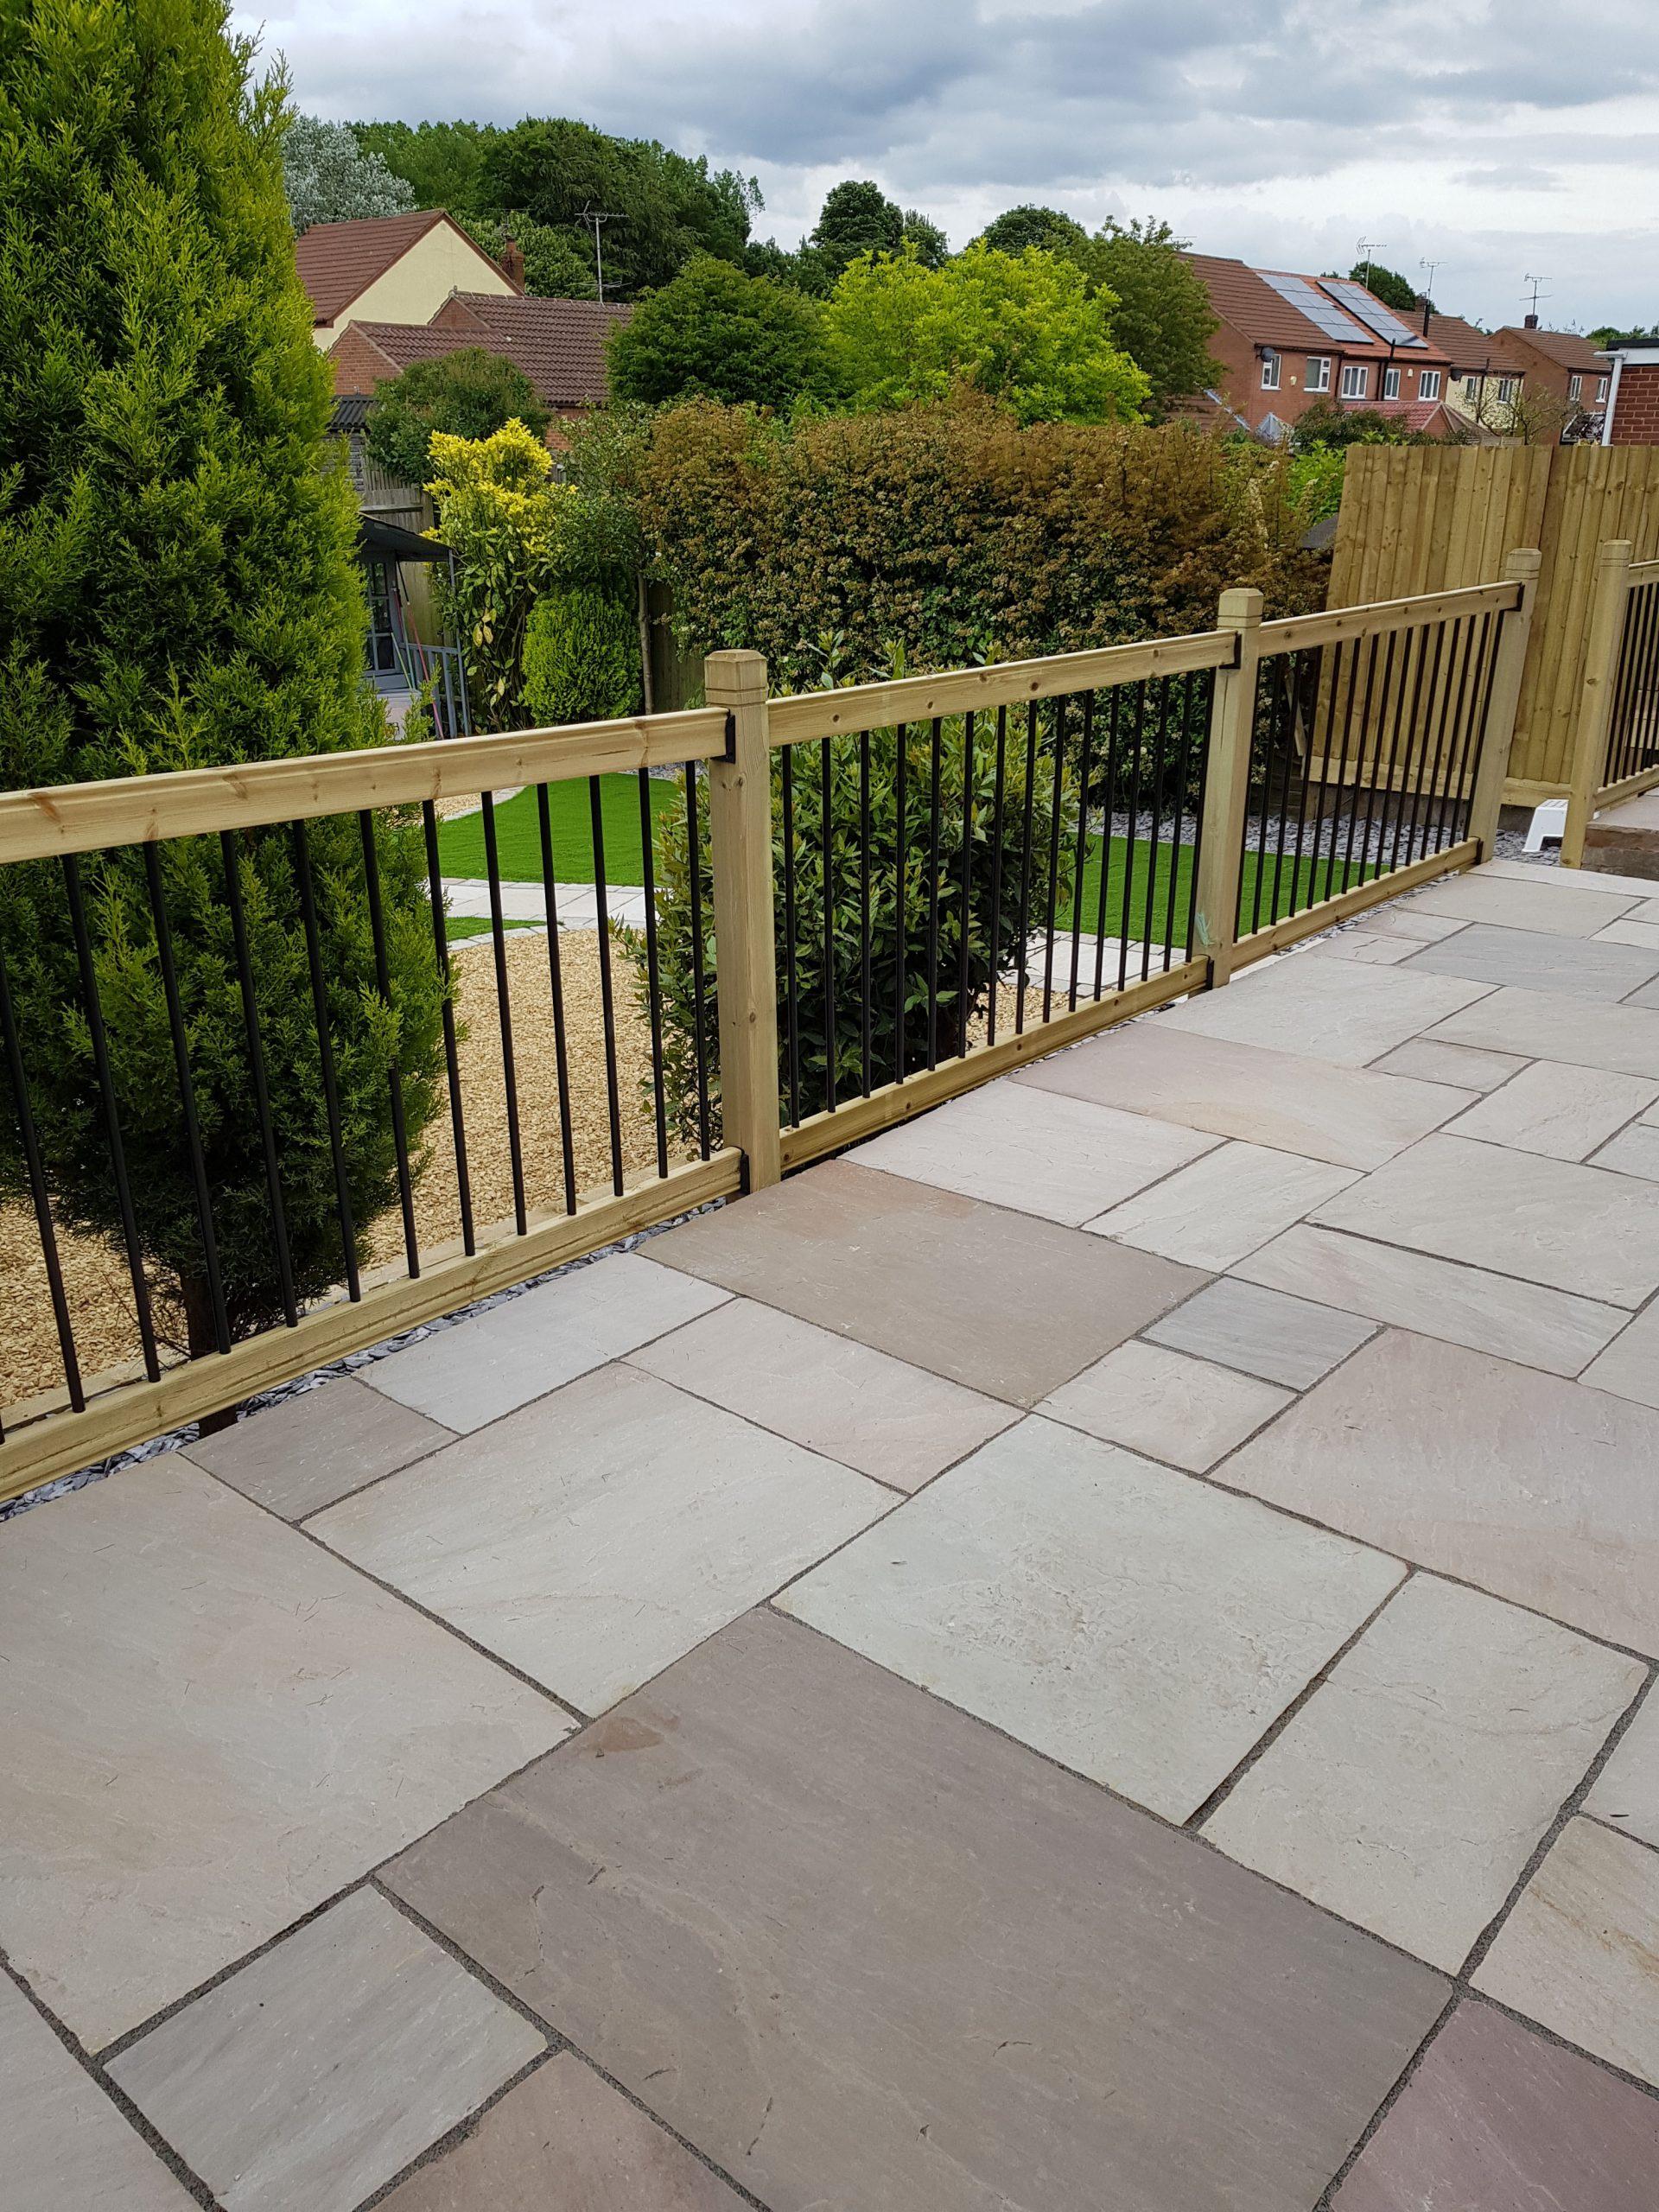 Raised patio seating area with railings